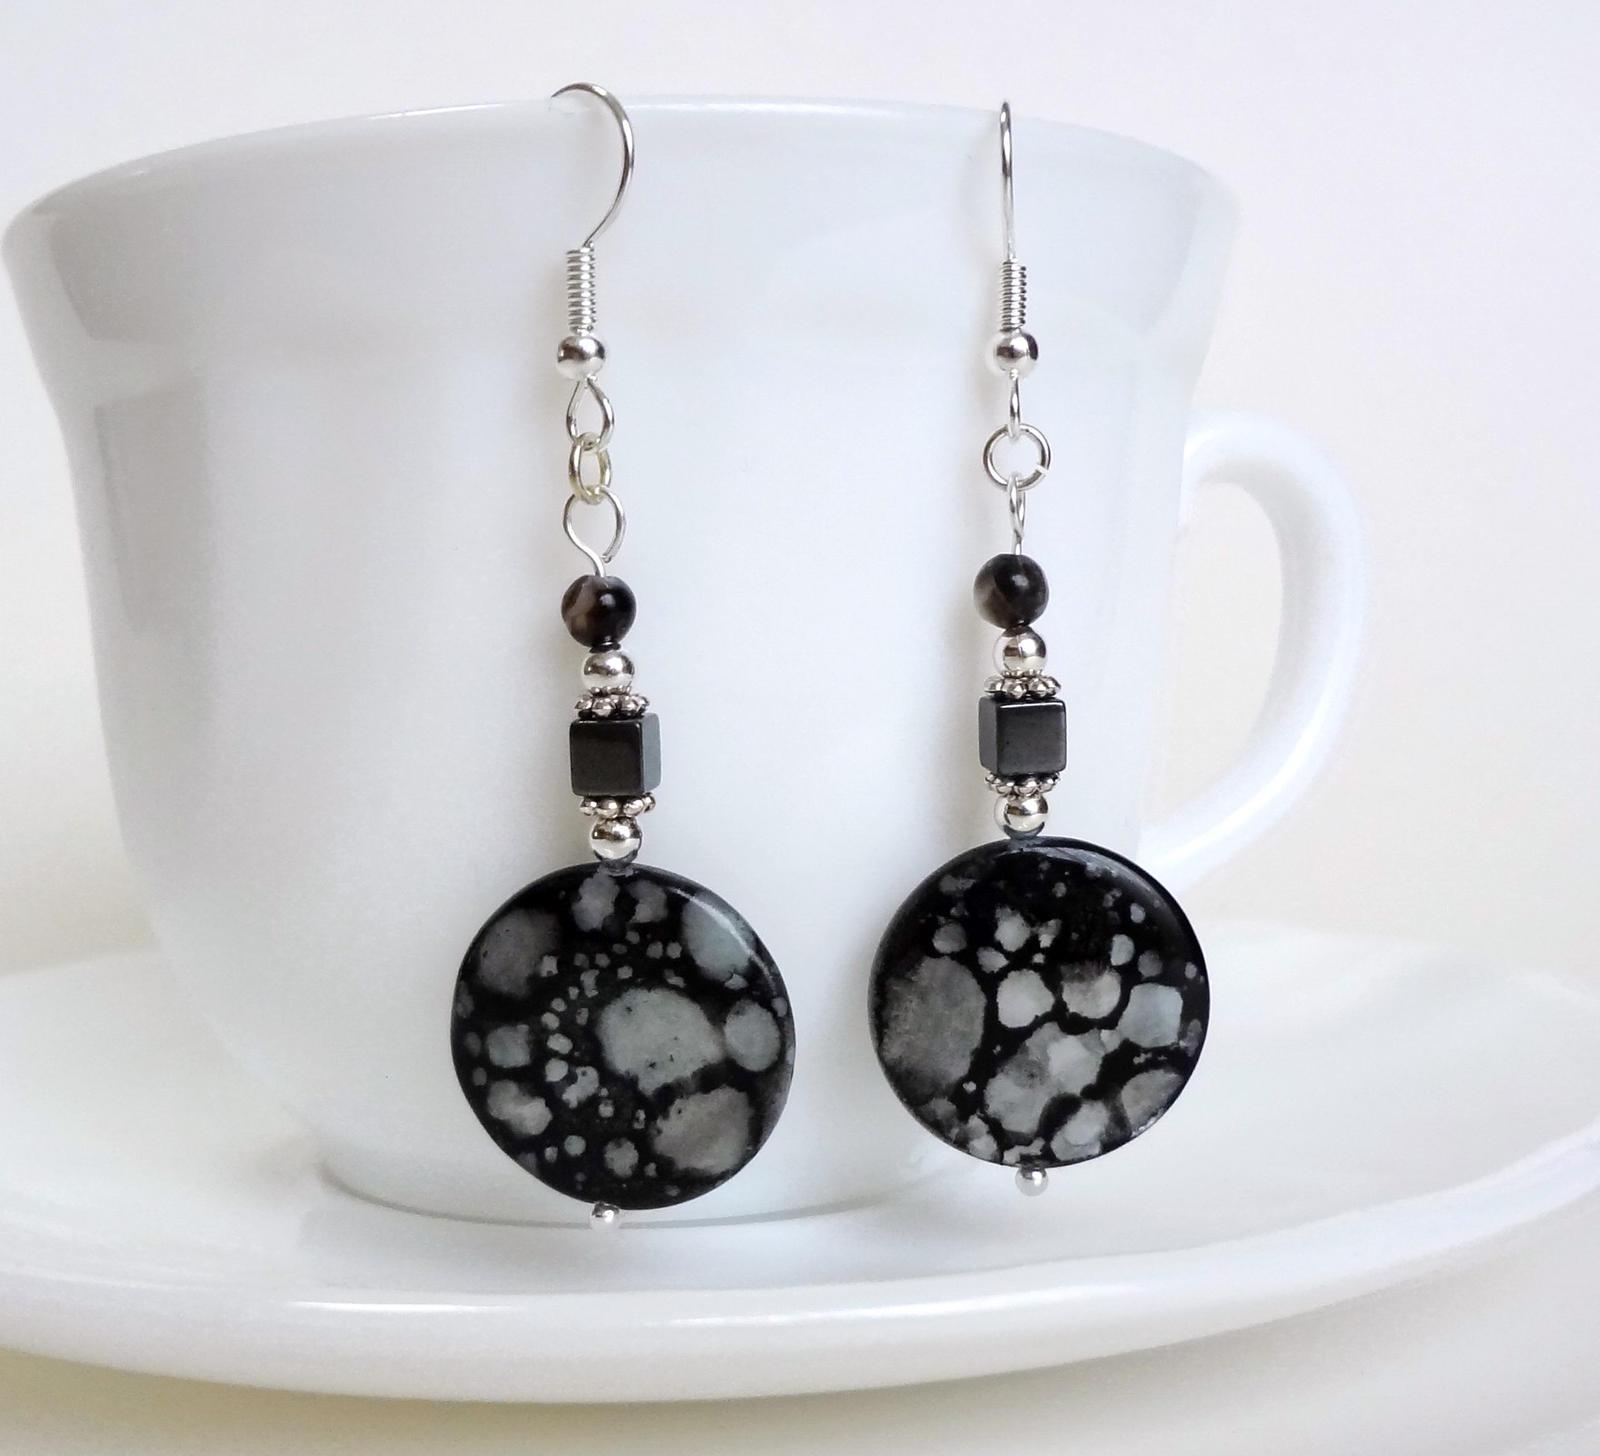 Black spotted shell earrings